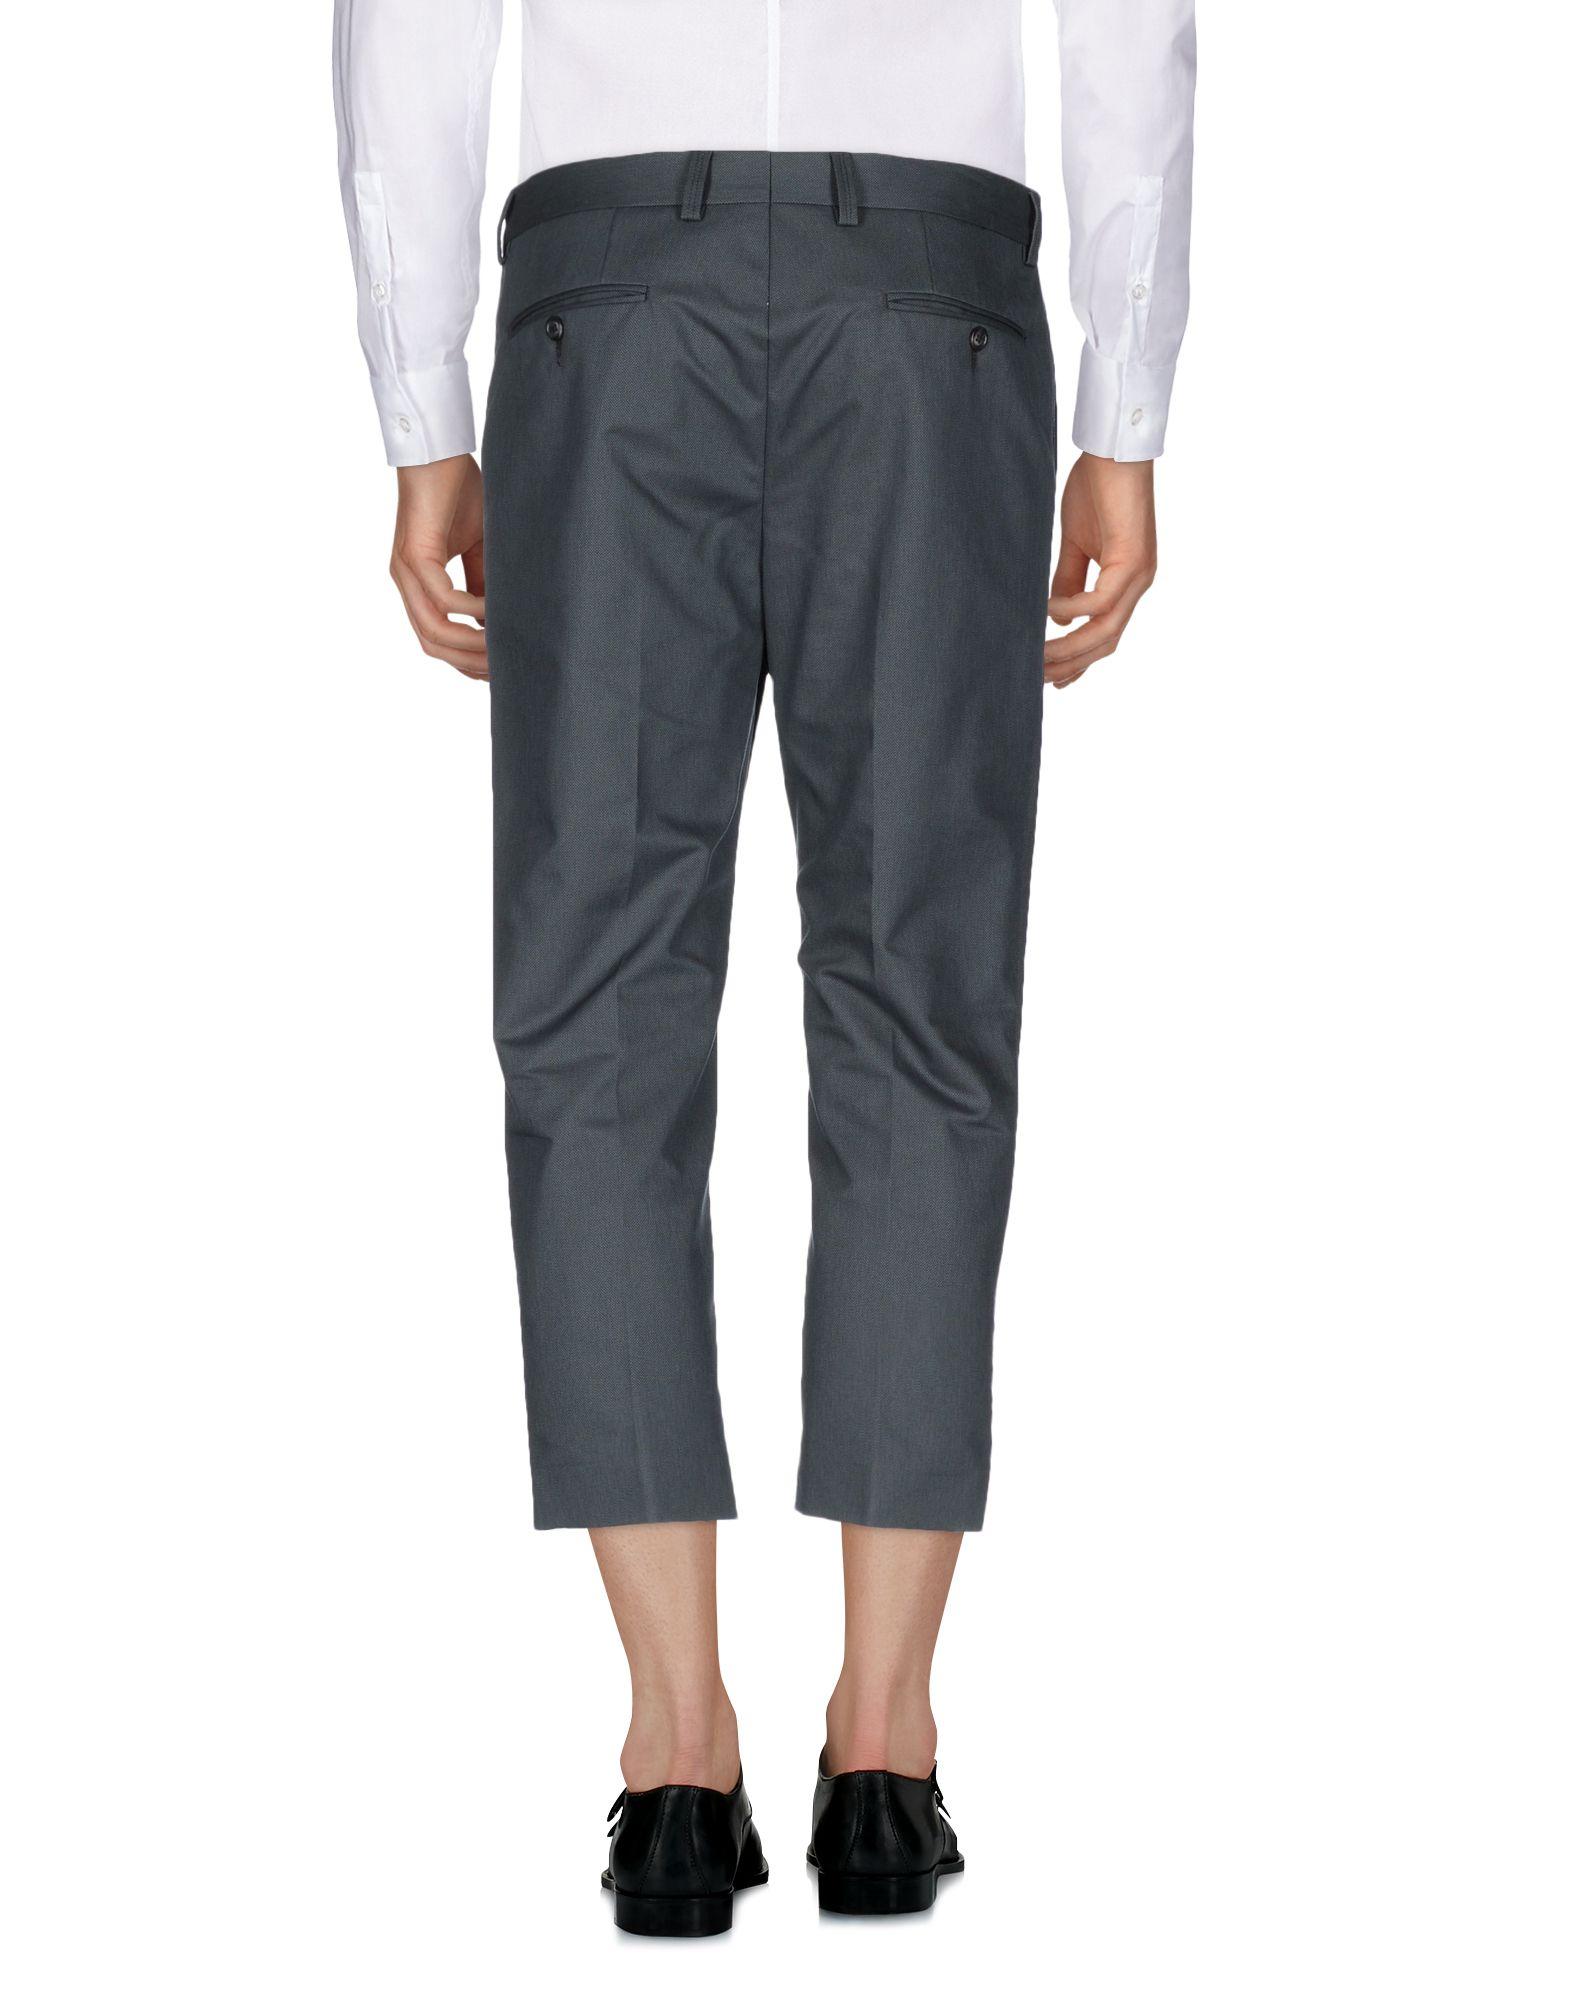 Pantalone Classico Dolce & Gabbana - Uomo - Gabbana 13010507NB 1e87e9